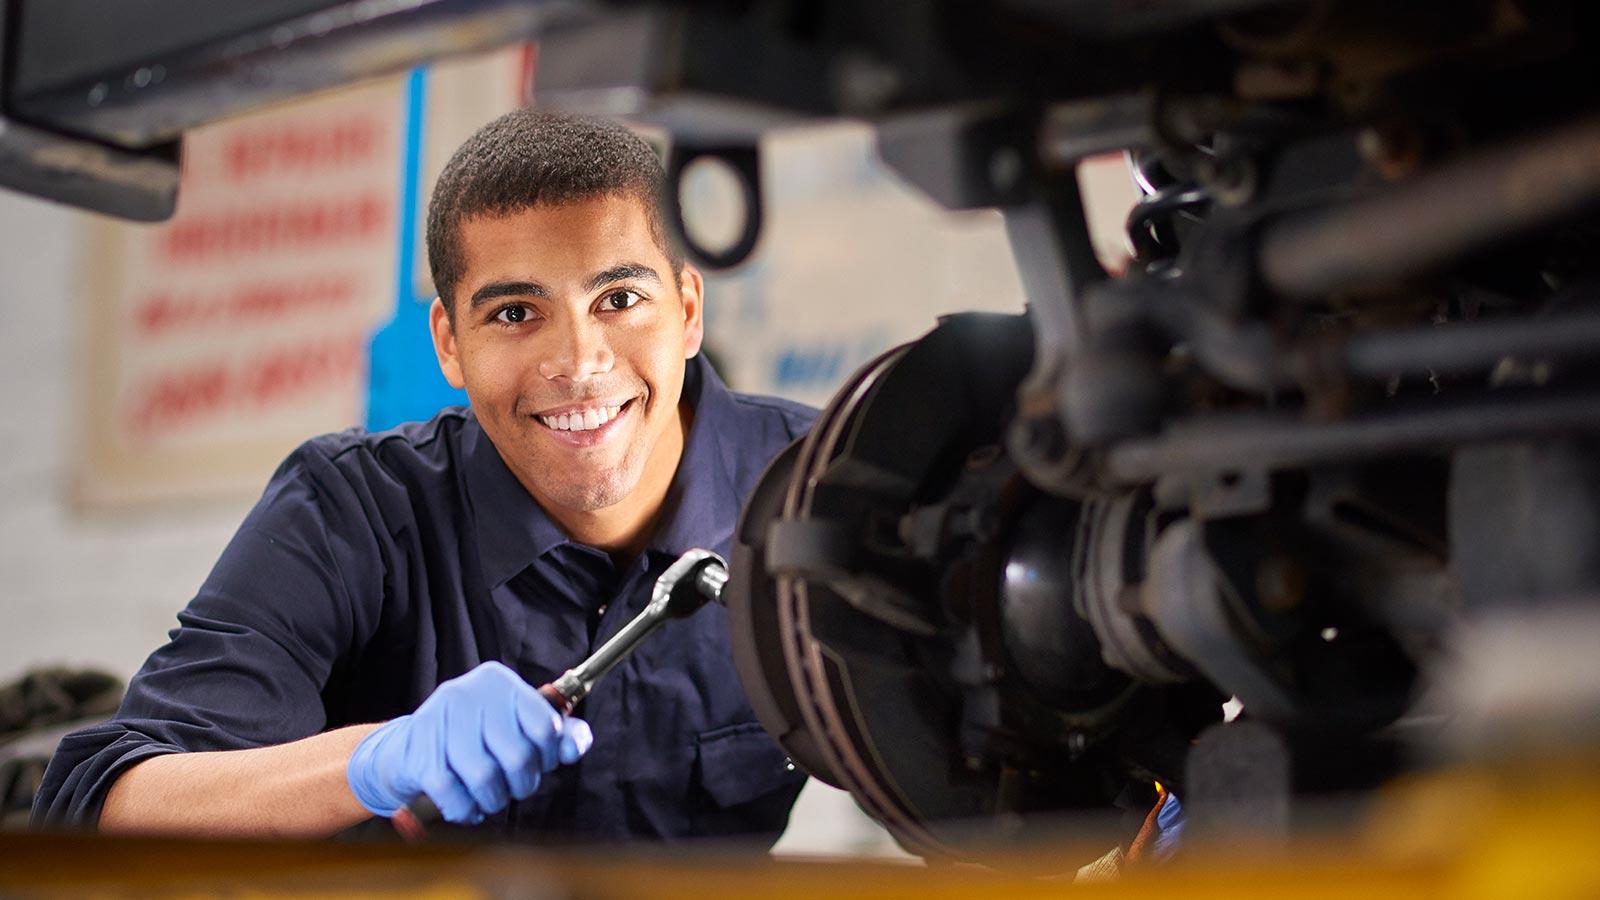 Tunex Services mechanic working on car